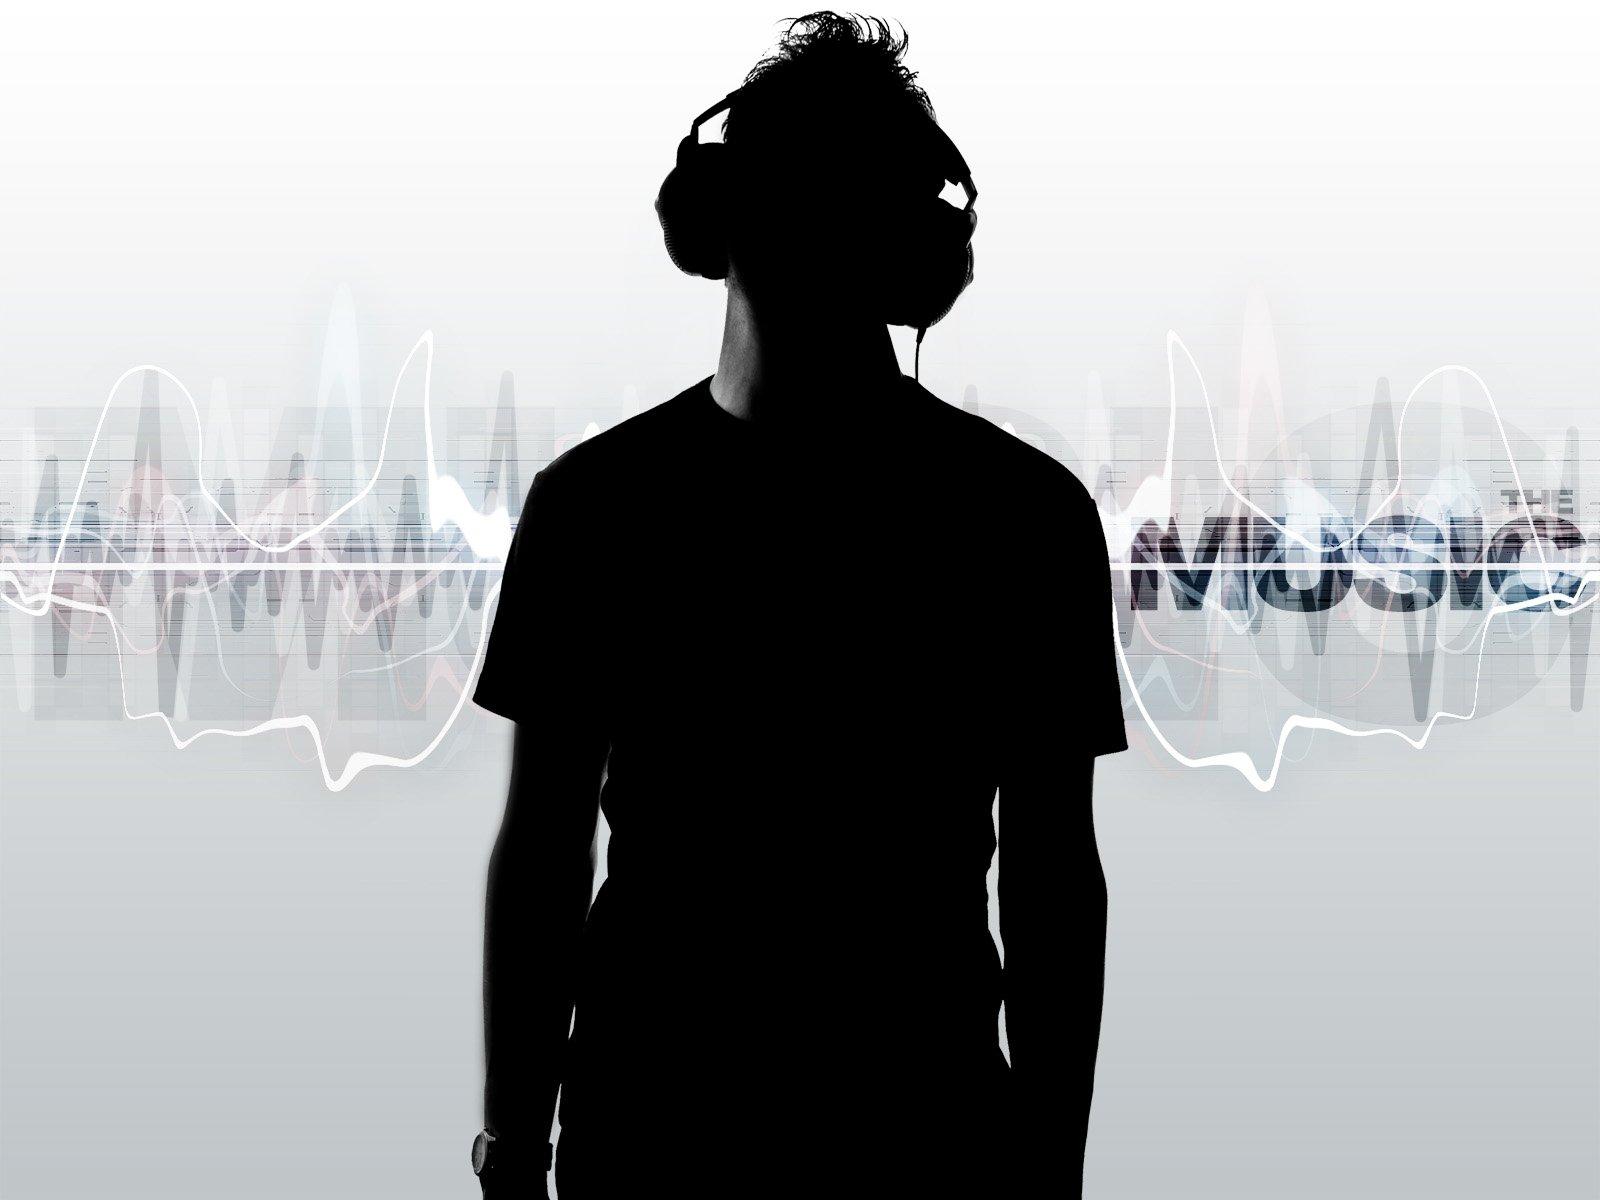 Download Wallpaper Music Person - thumb-1920-40370  Trends_23488.jpg